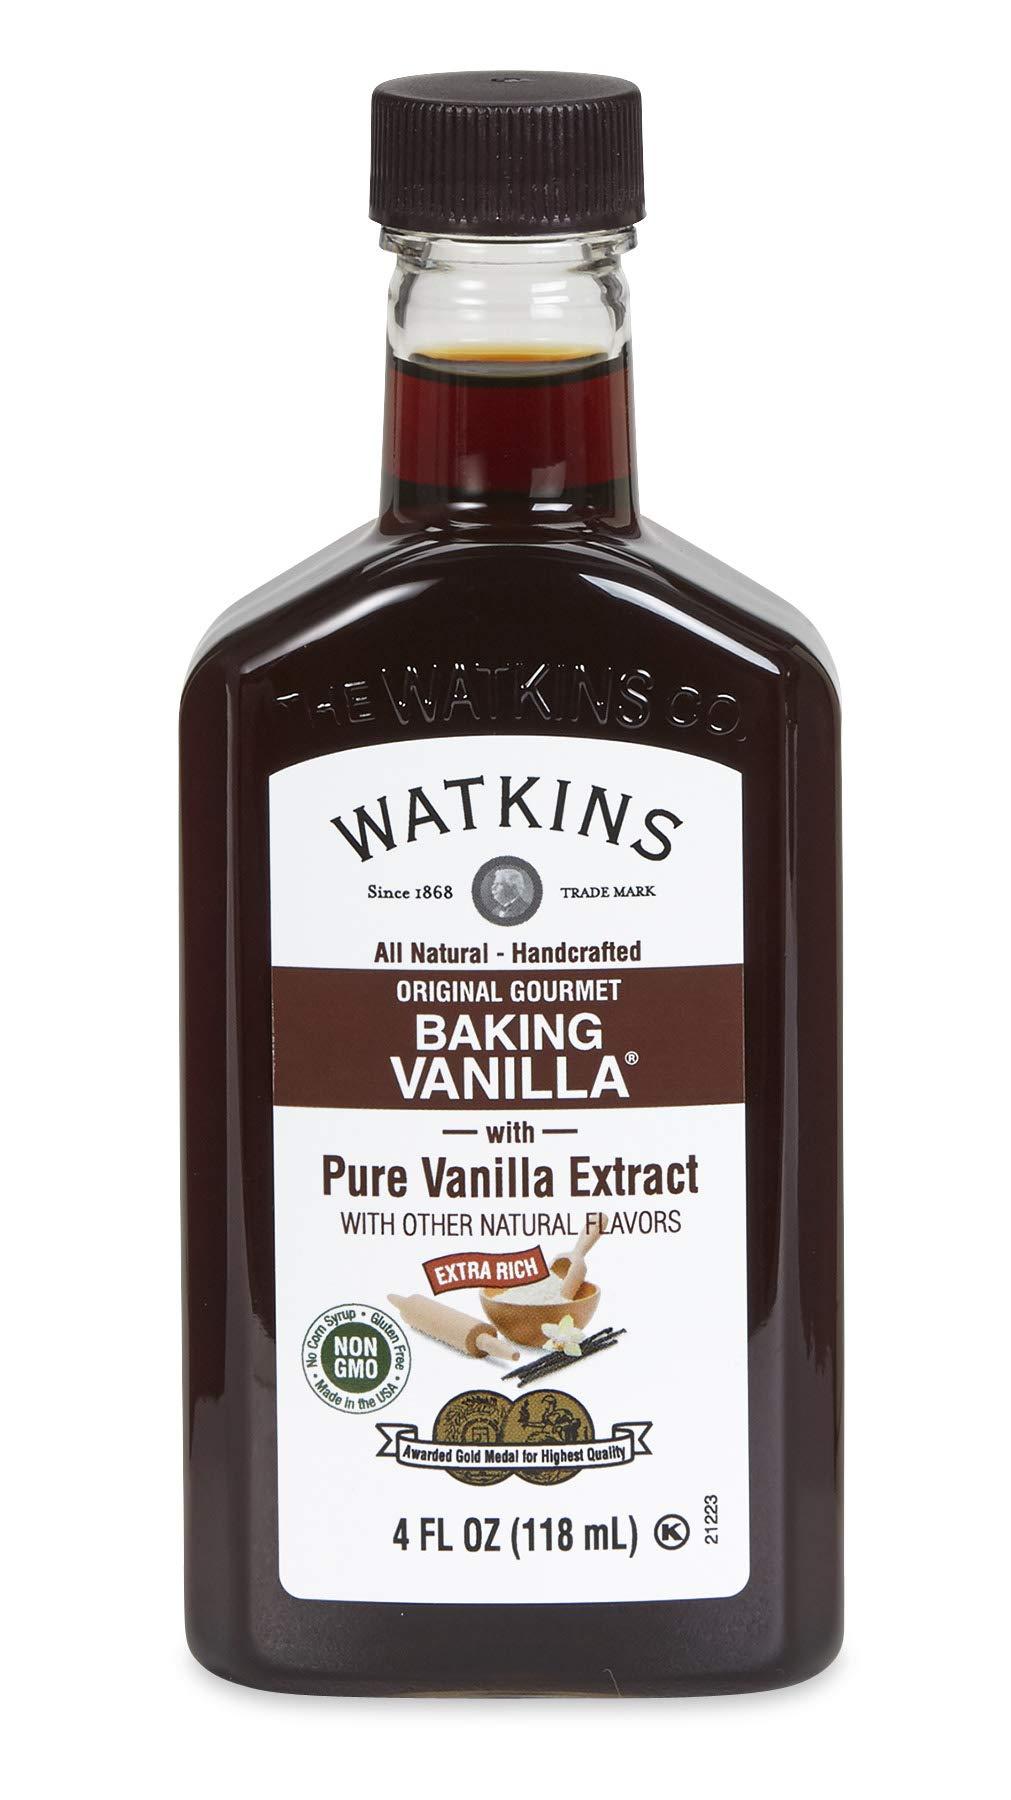 Watkins All Natural Original Gourmet Baking Vanilla Extract, 4 Fl Oz (Pack of 1)